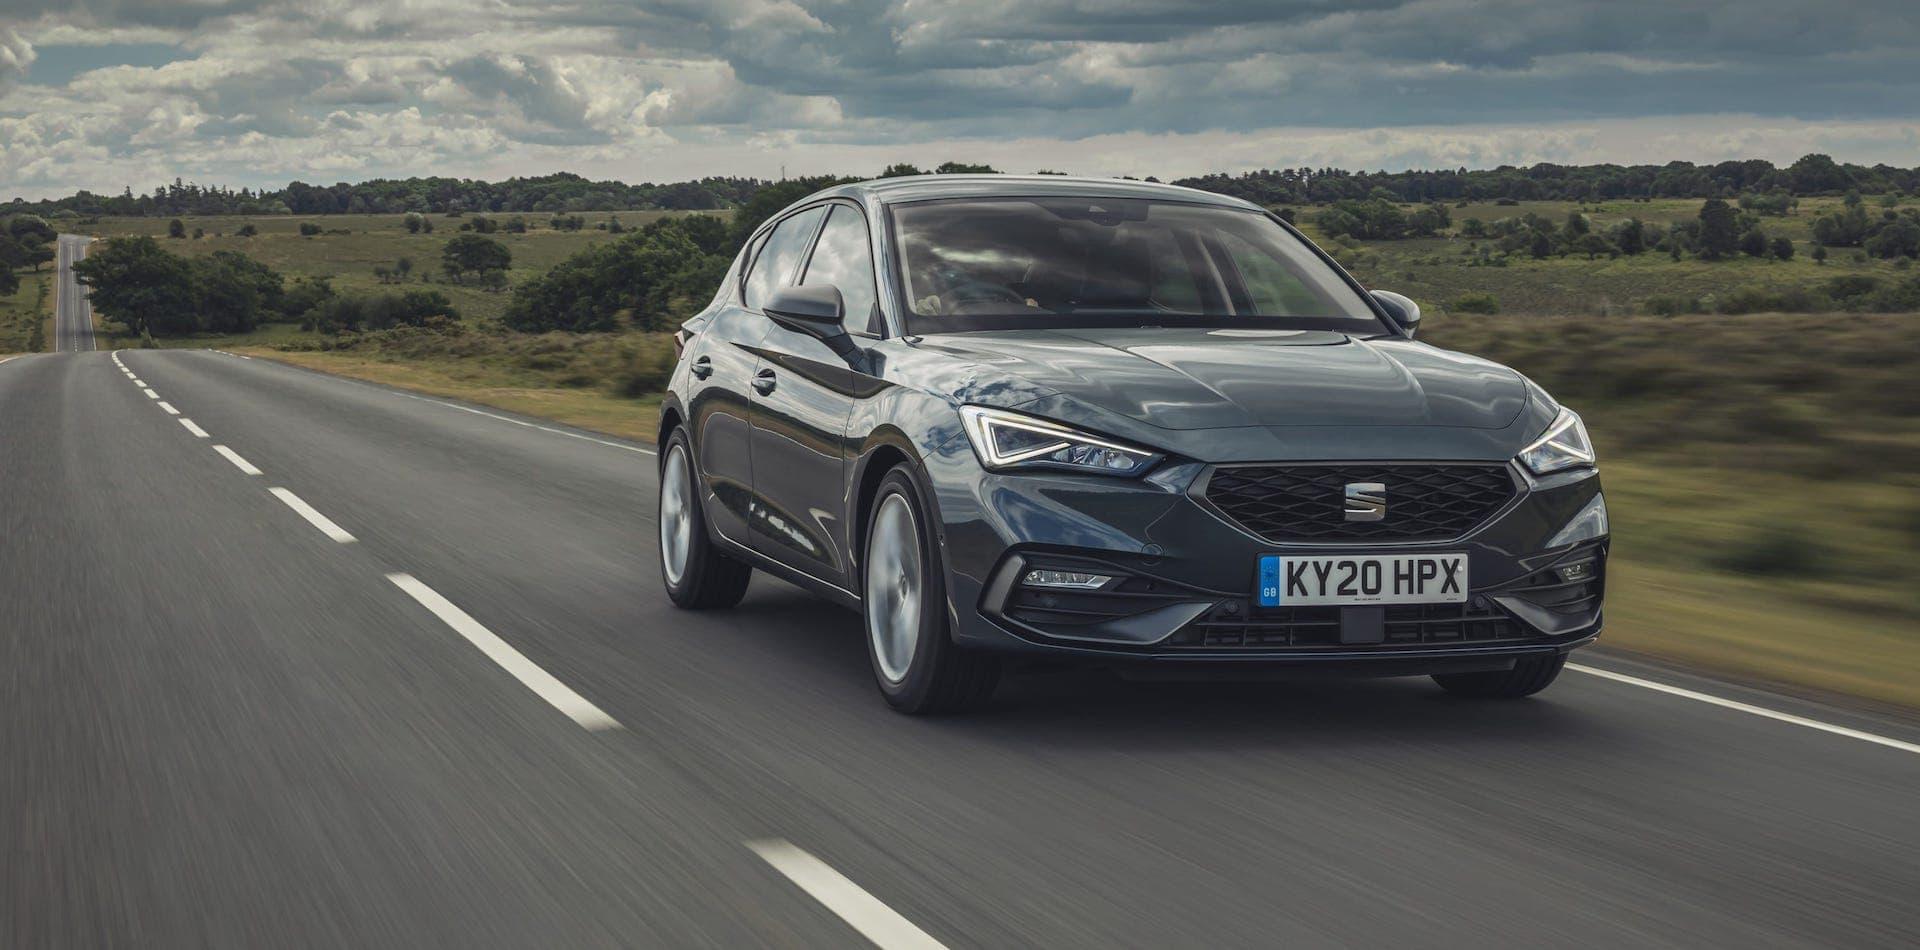 SEAT Leon test drive 2020 wallpaper